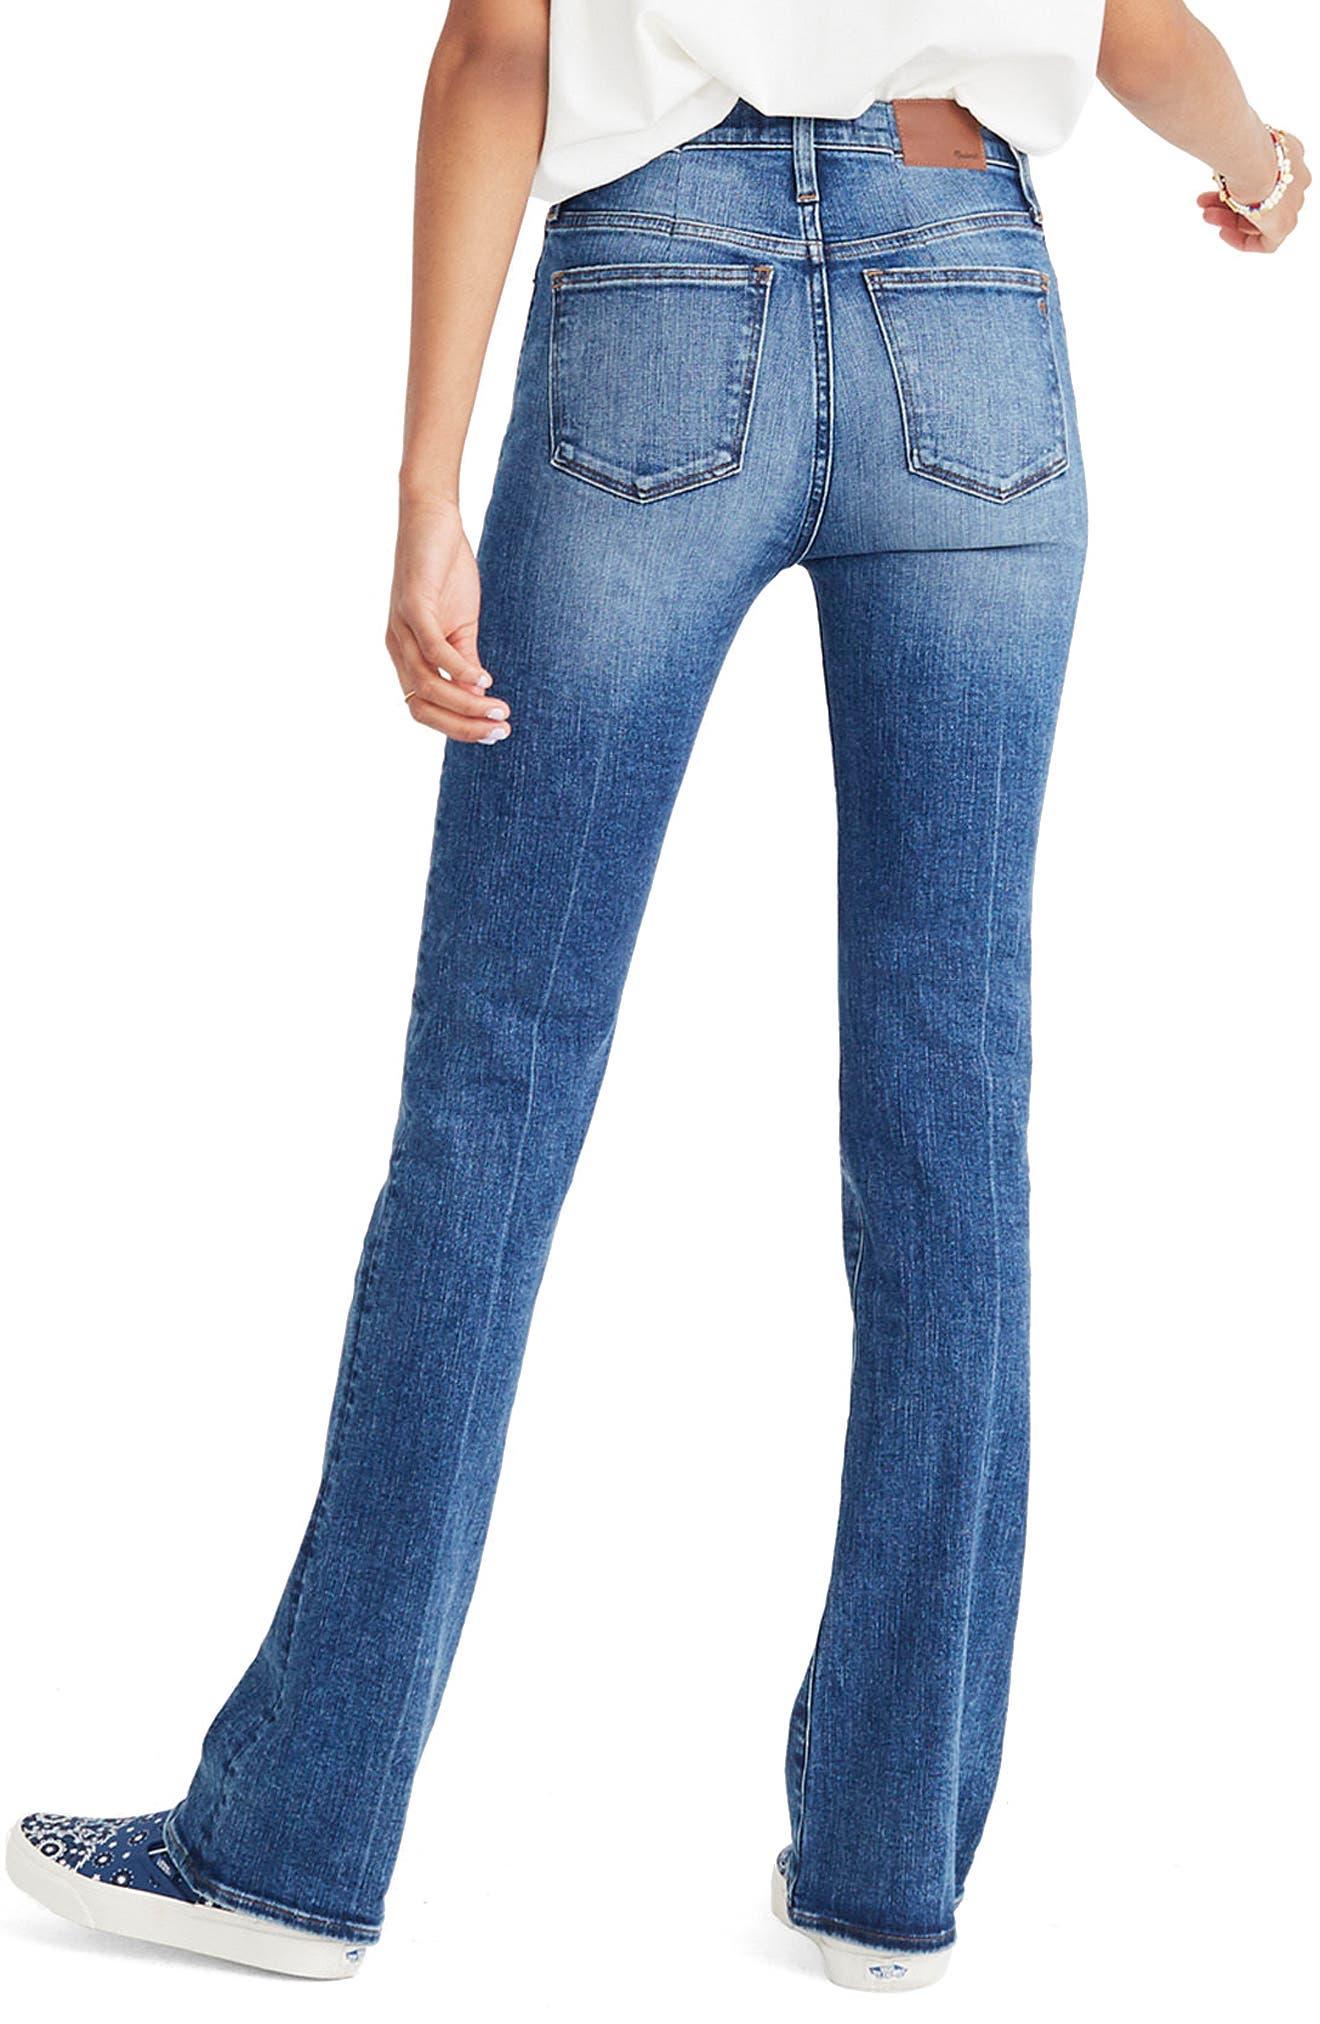 Skinny Flare Leg Jeans,                             Alternate thumbnail 2, color,                             400